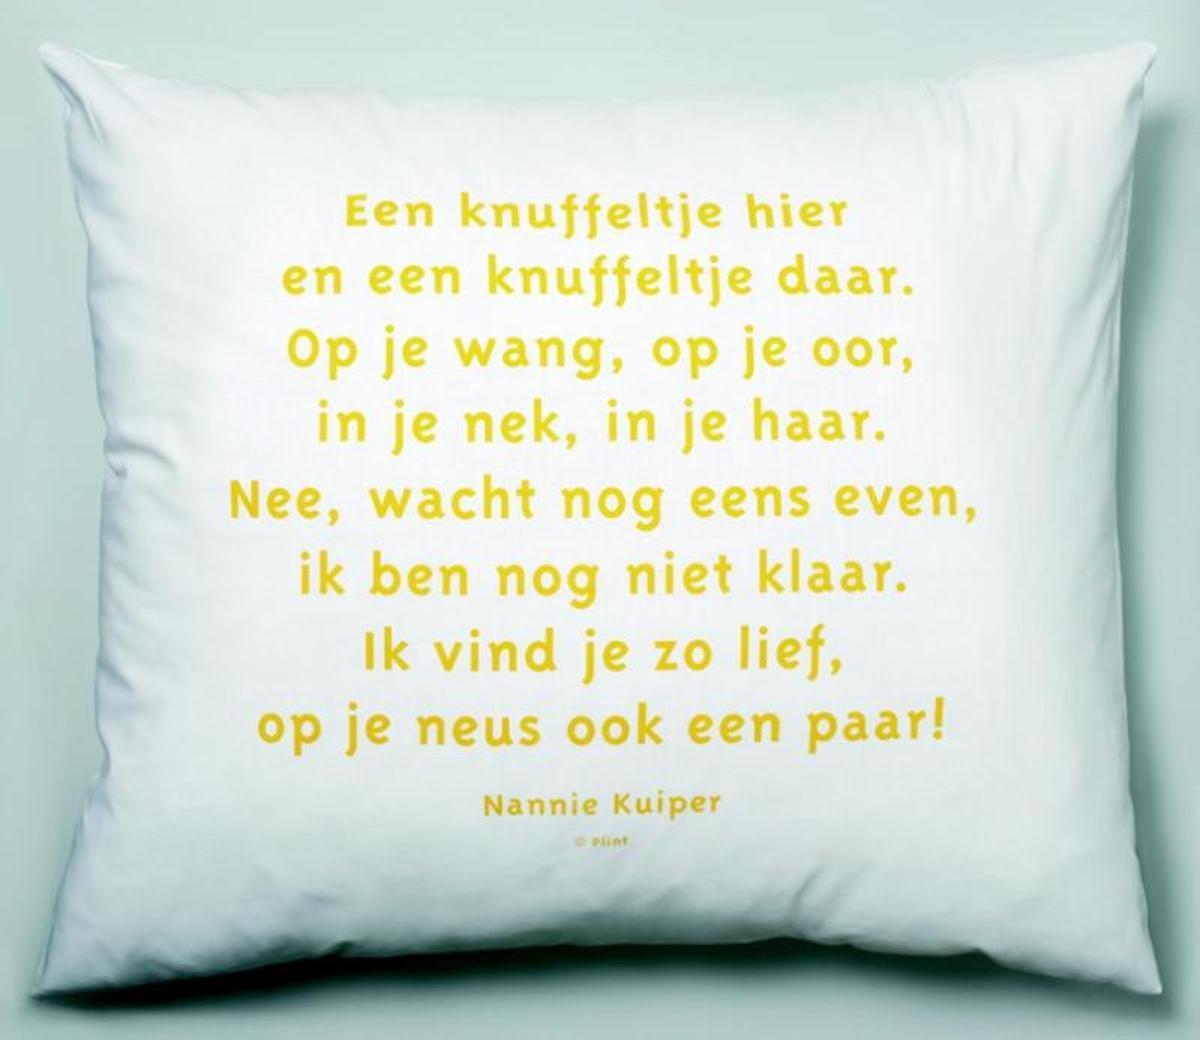 Extreem bol.com | Poezie om te kussen SL 4 - Nannie Kuiper gedicht. een #JG98